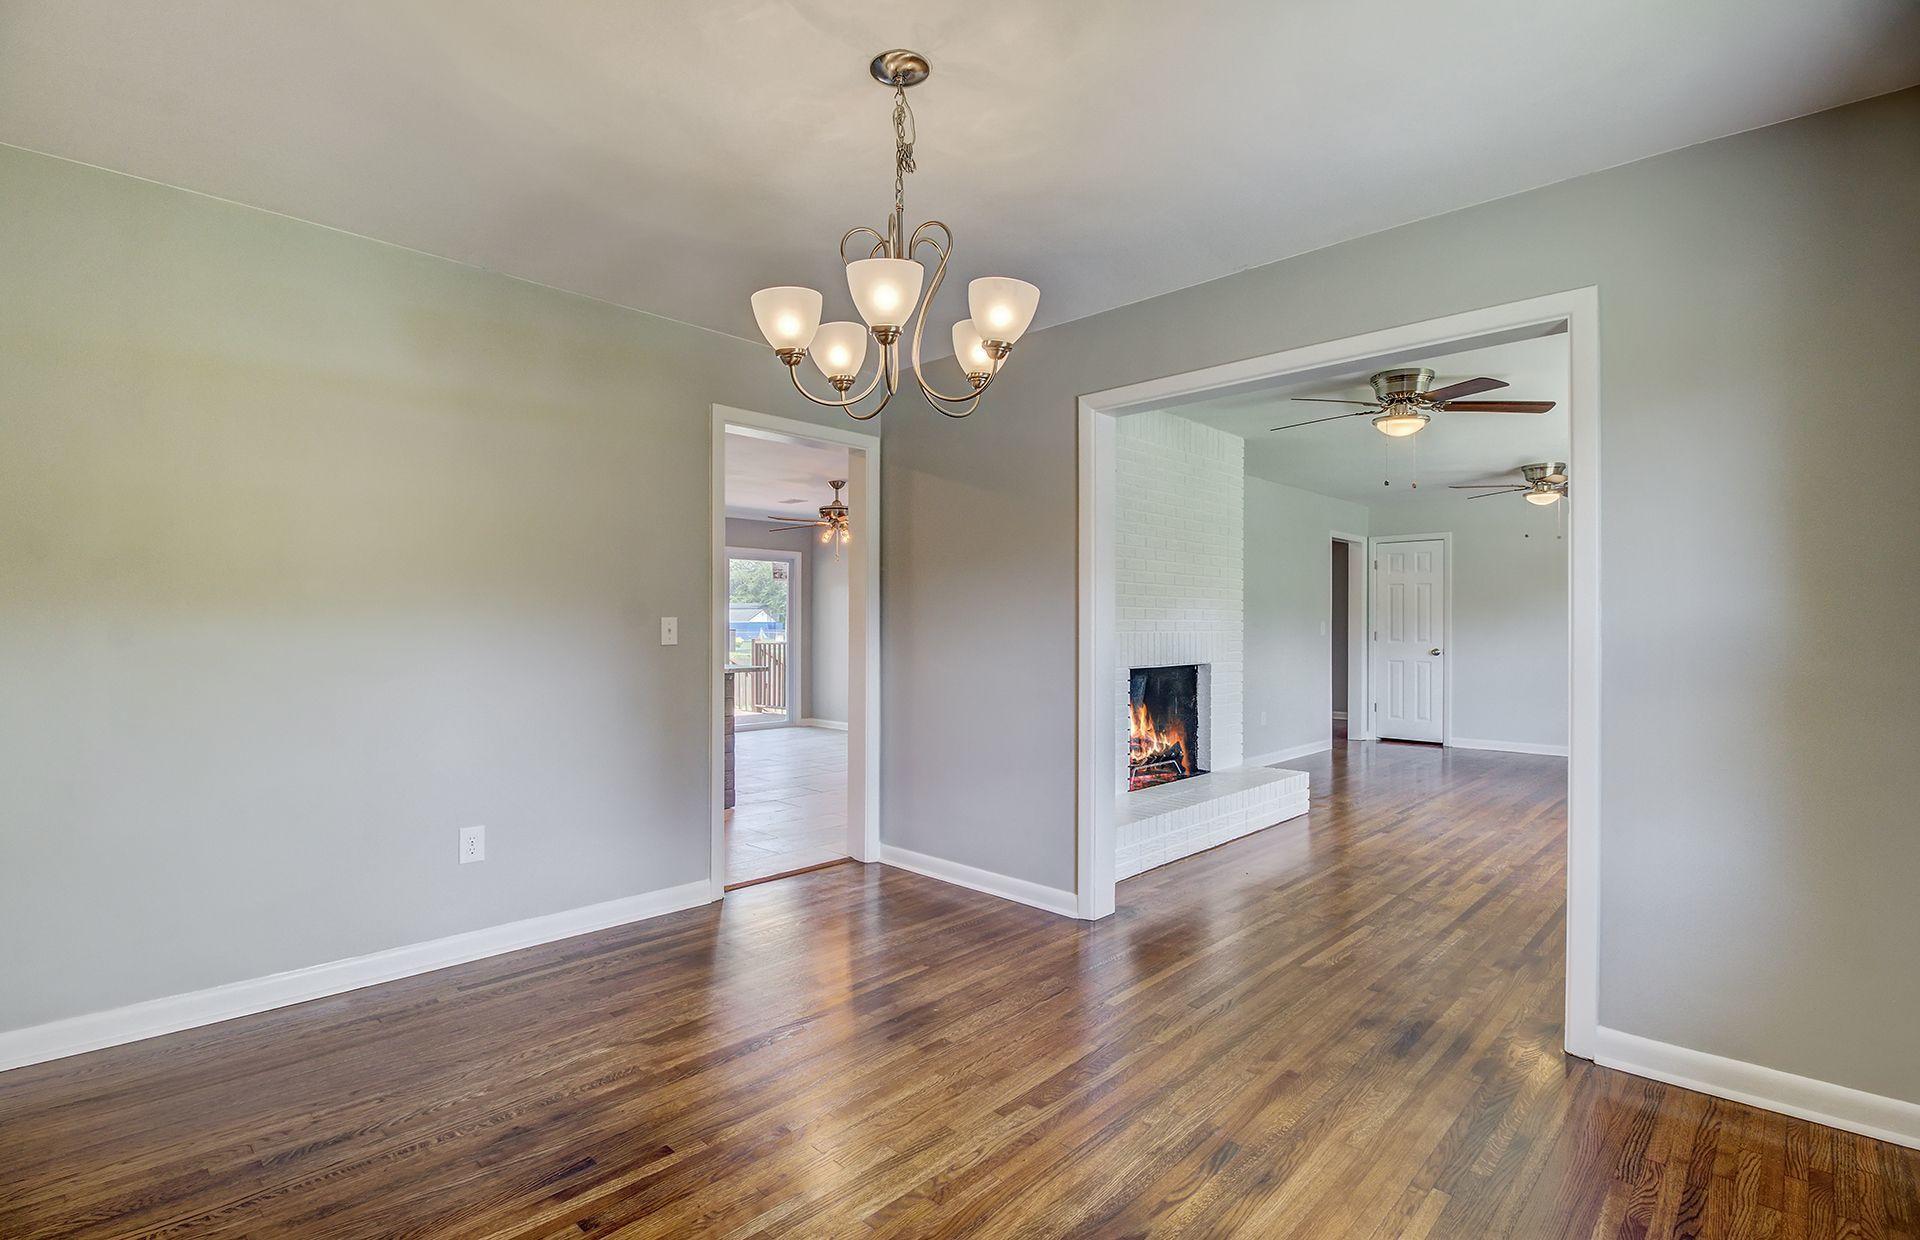 Belvedere Estates Homes For Sale - 6010 Ridgecrest, Hanahan, SC - 3